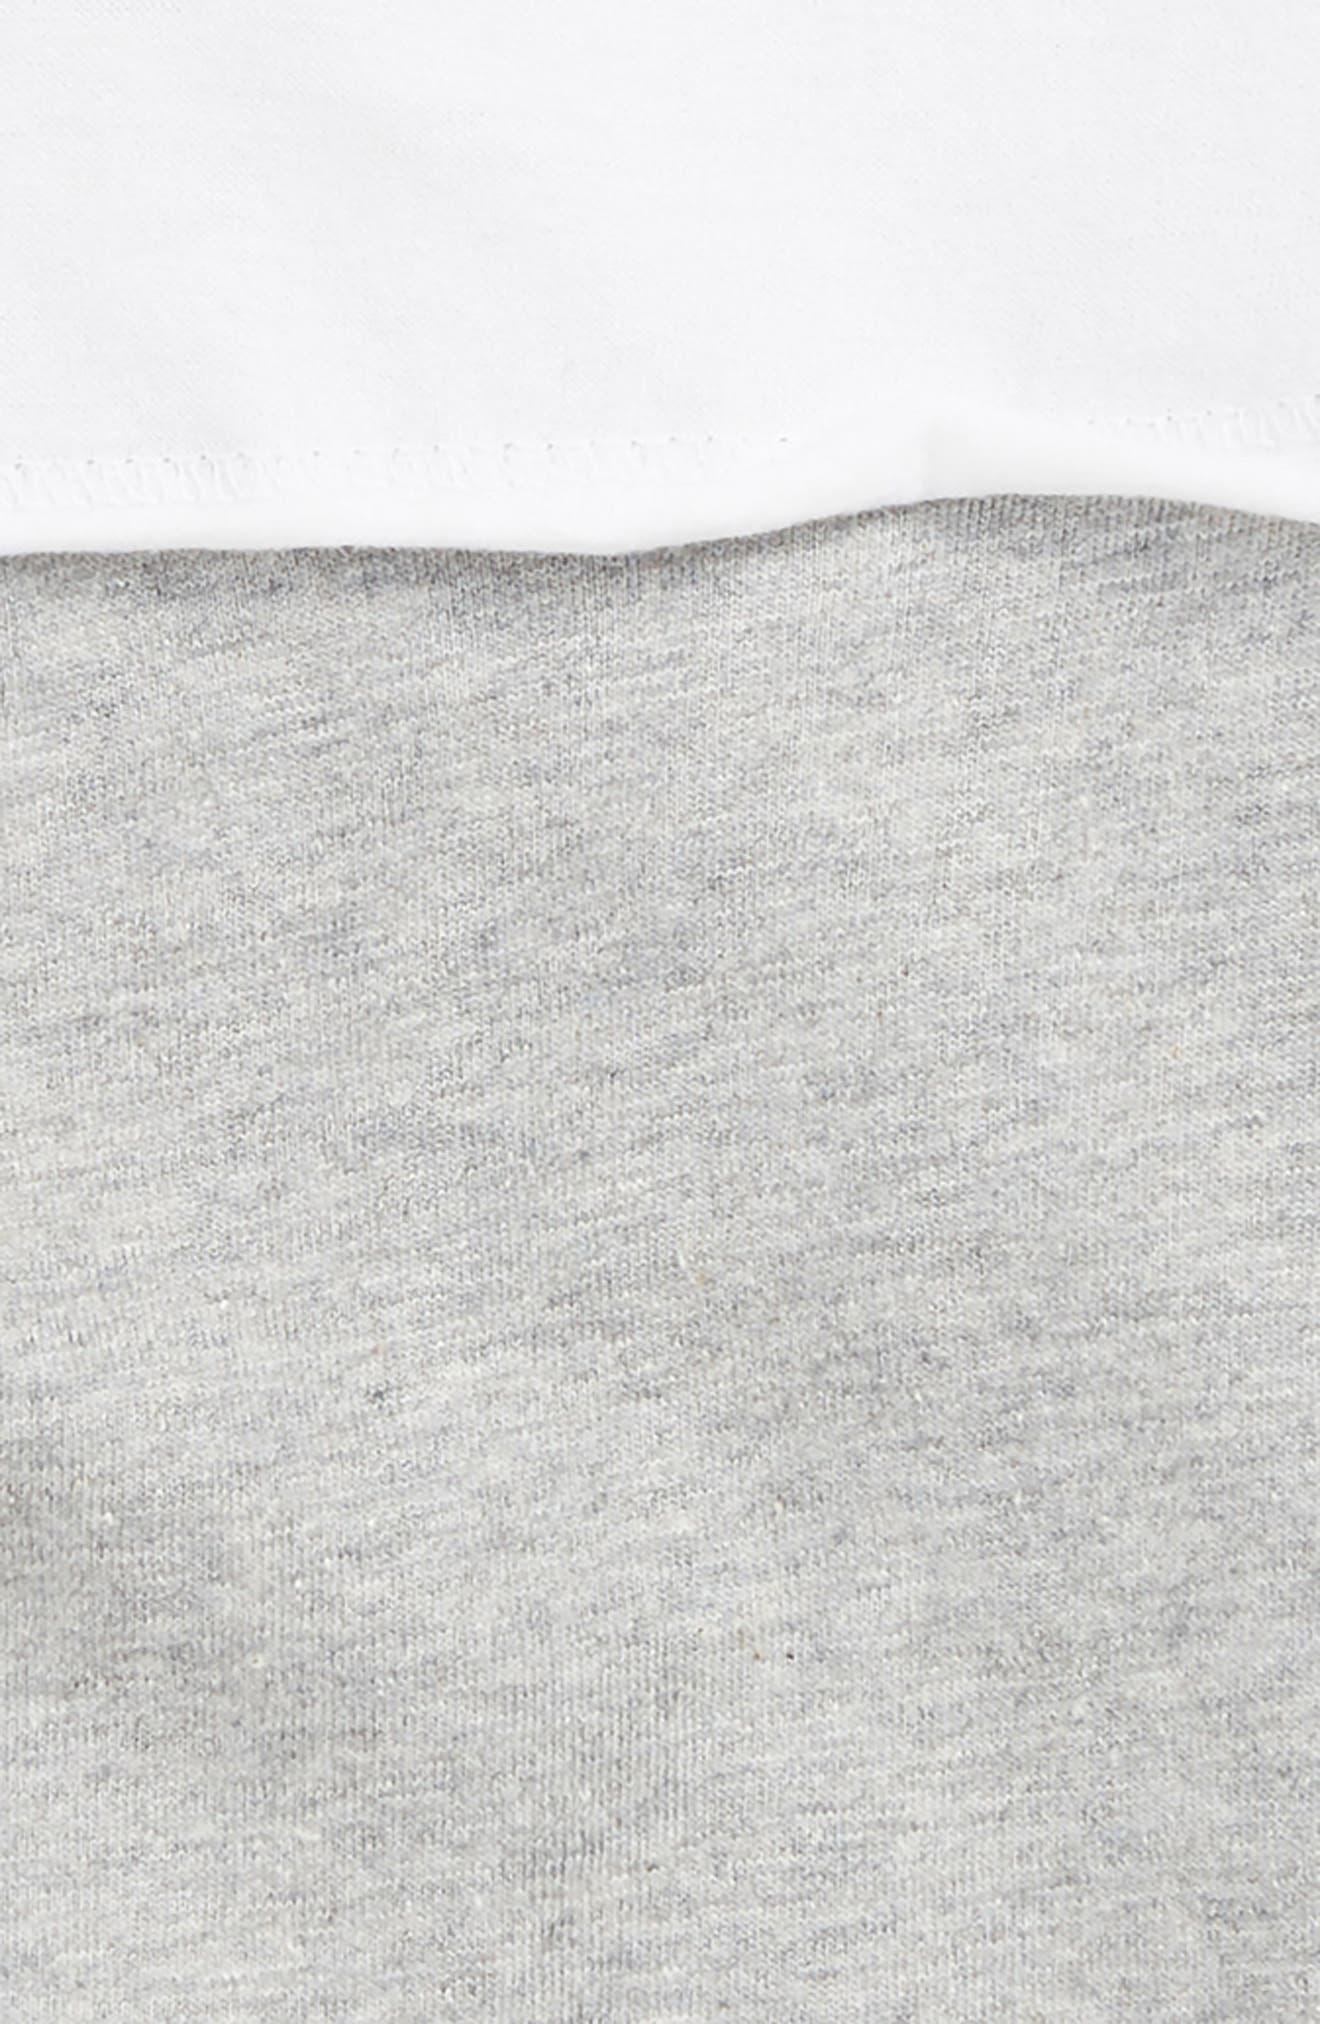 BURT'S BEES BABY, Colorblock Organic Cotton Bodysuit, Alternate thumbnail 2, color, 050